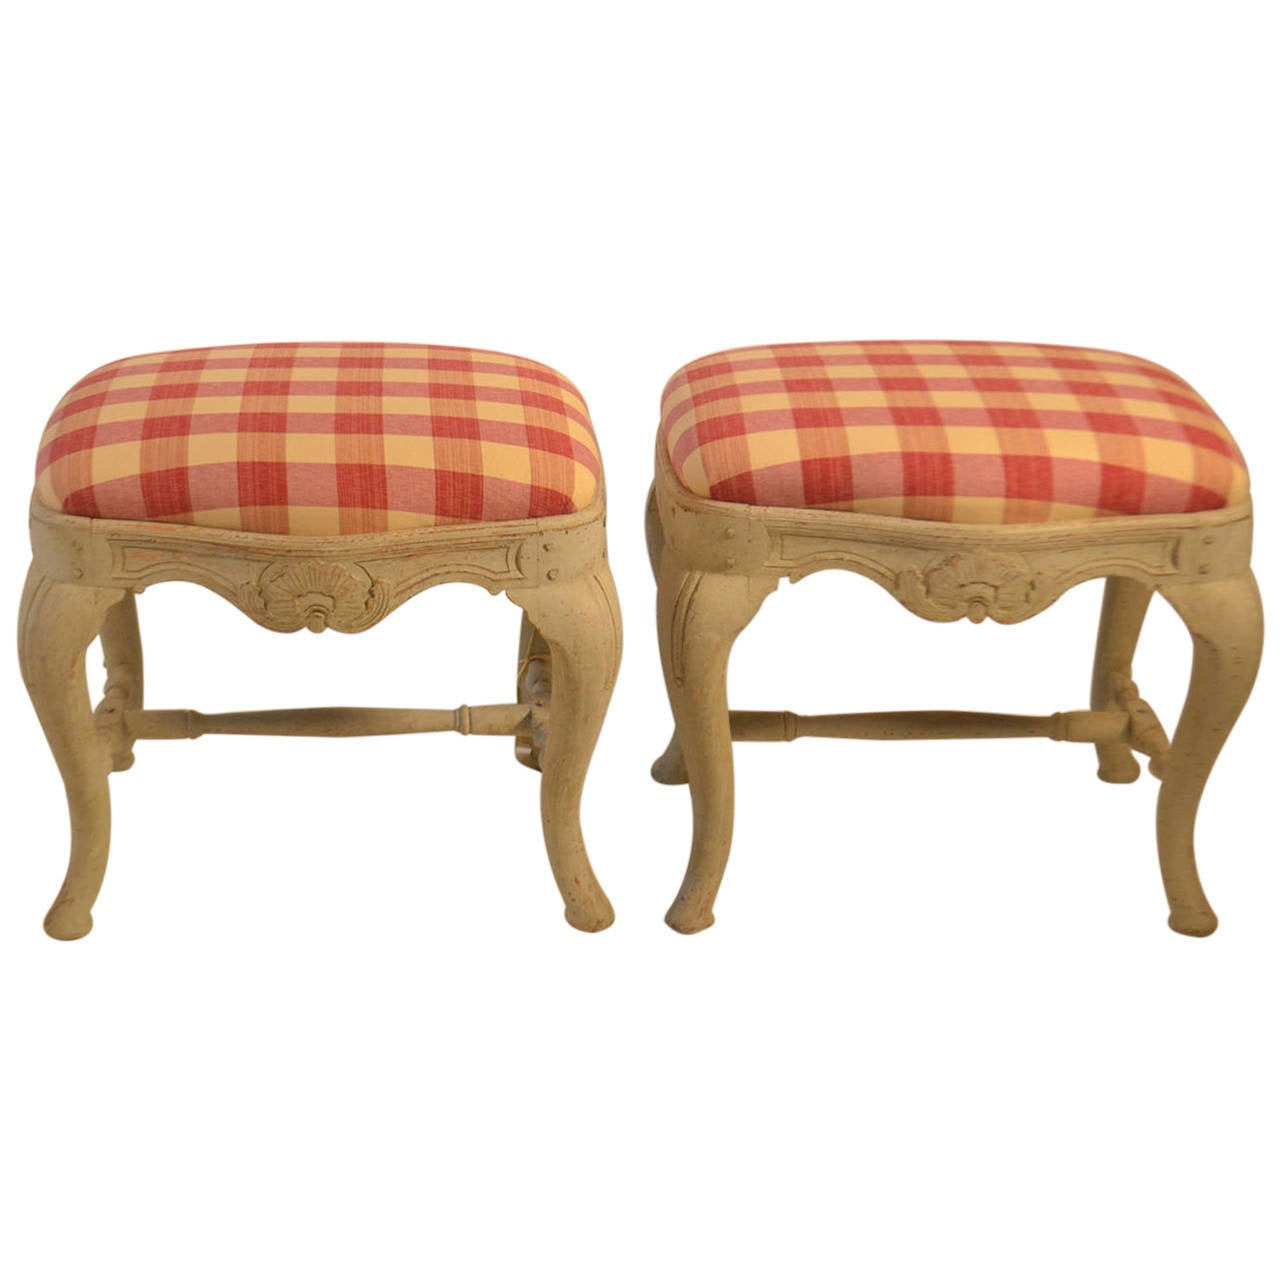 19th Century Pair of Swedish Footstools